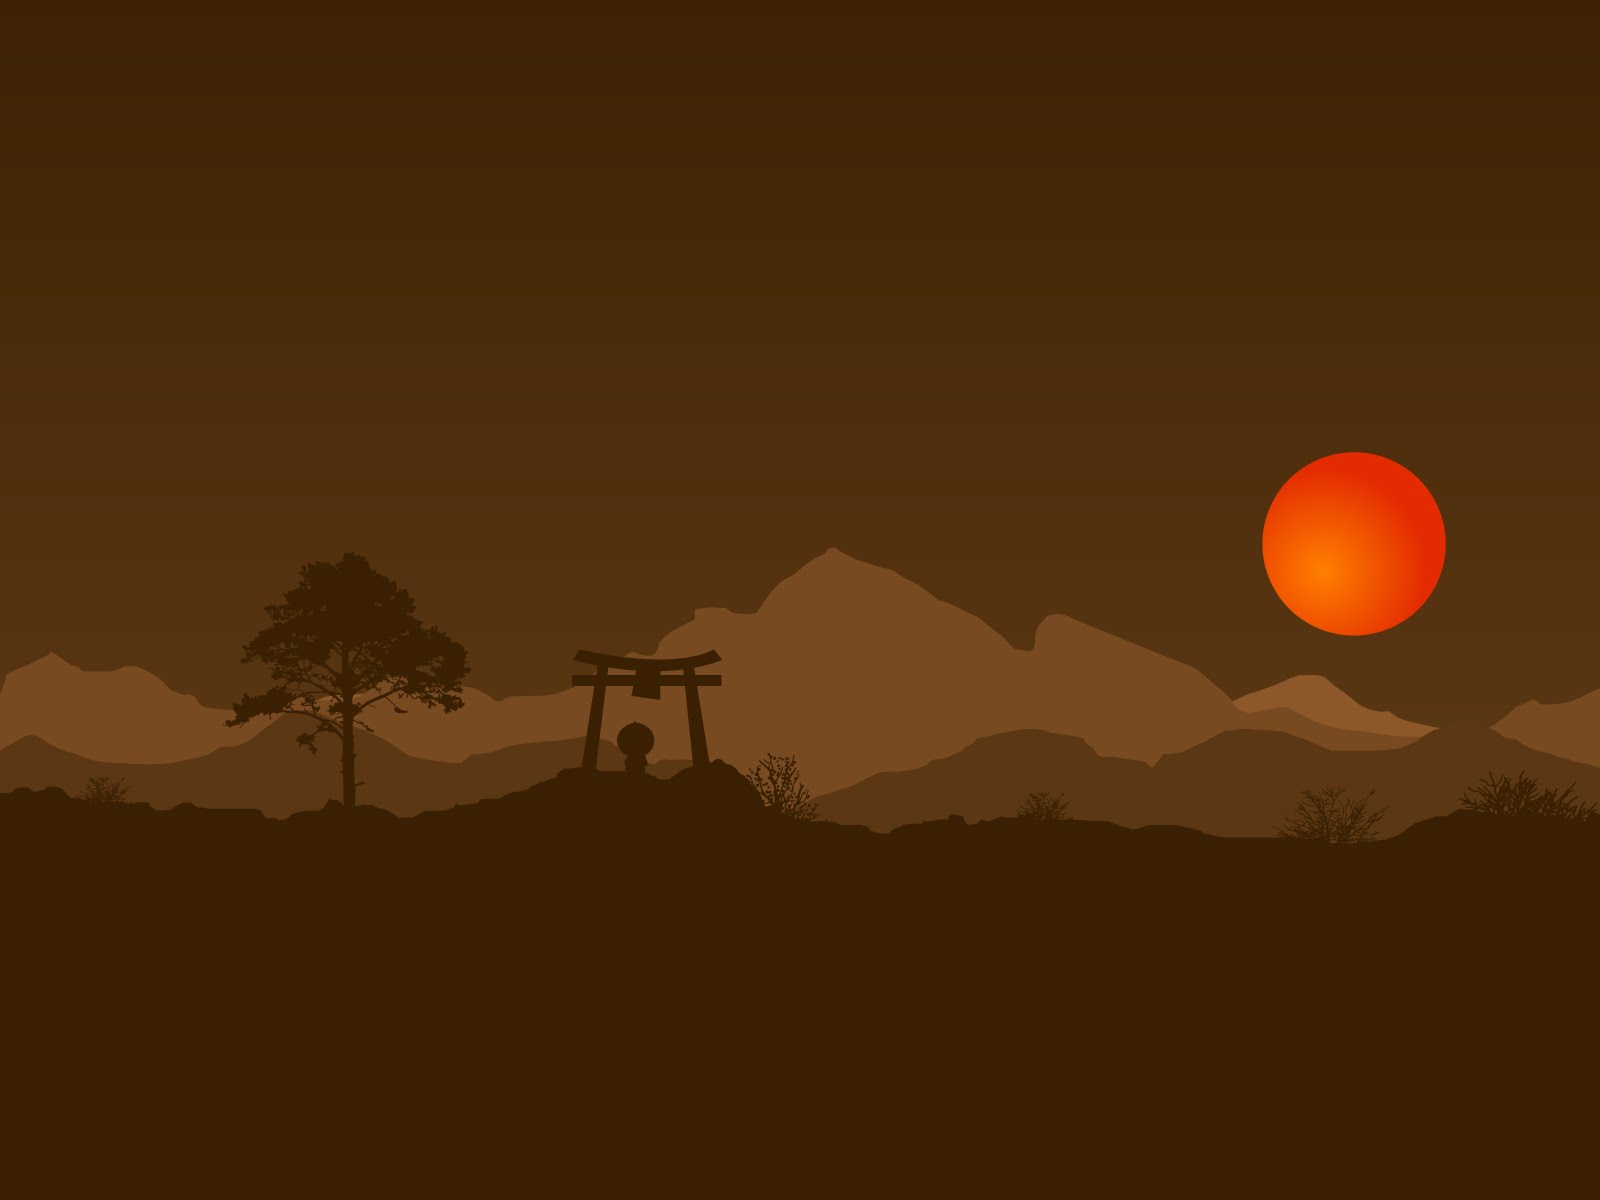 Theme Bin Blog Archive Japan Hills High Resolution Wallpaper 1600x1200